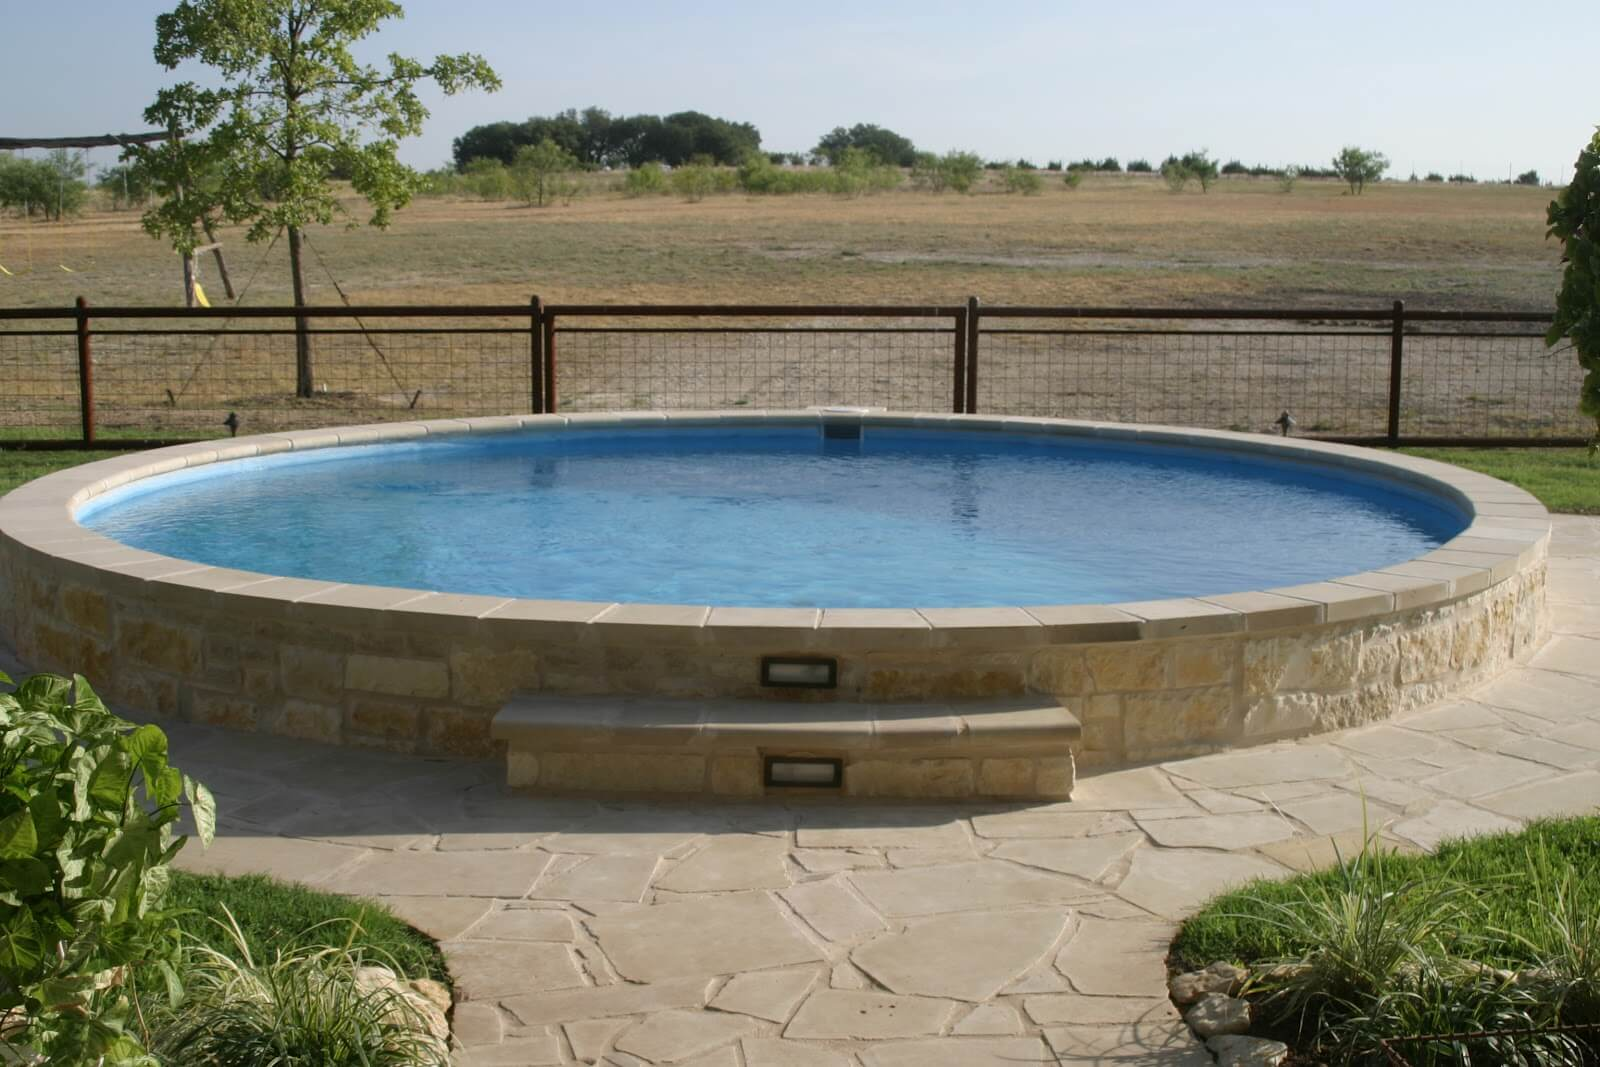 Pools yeske tanks - Convert swimming pool to rainwater tank ...